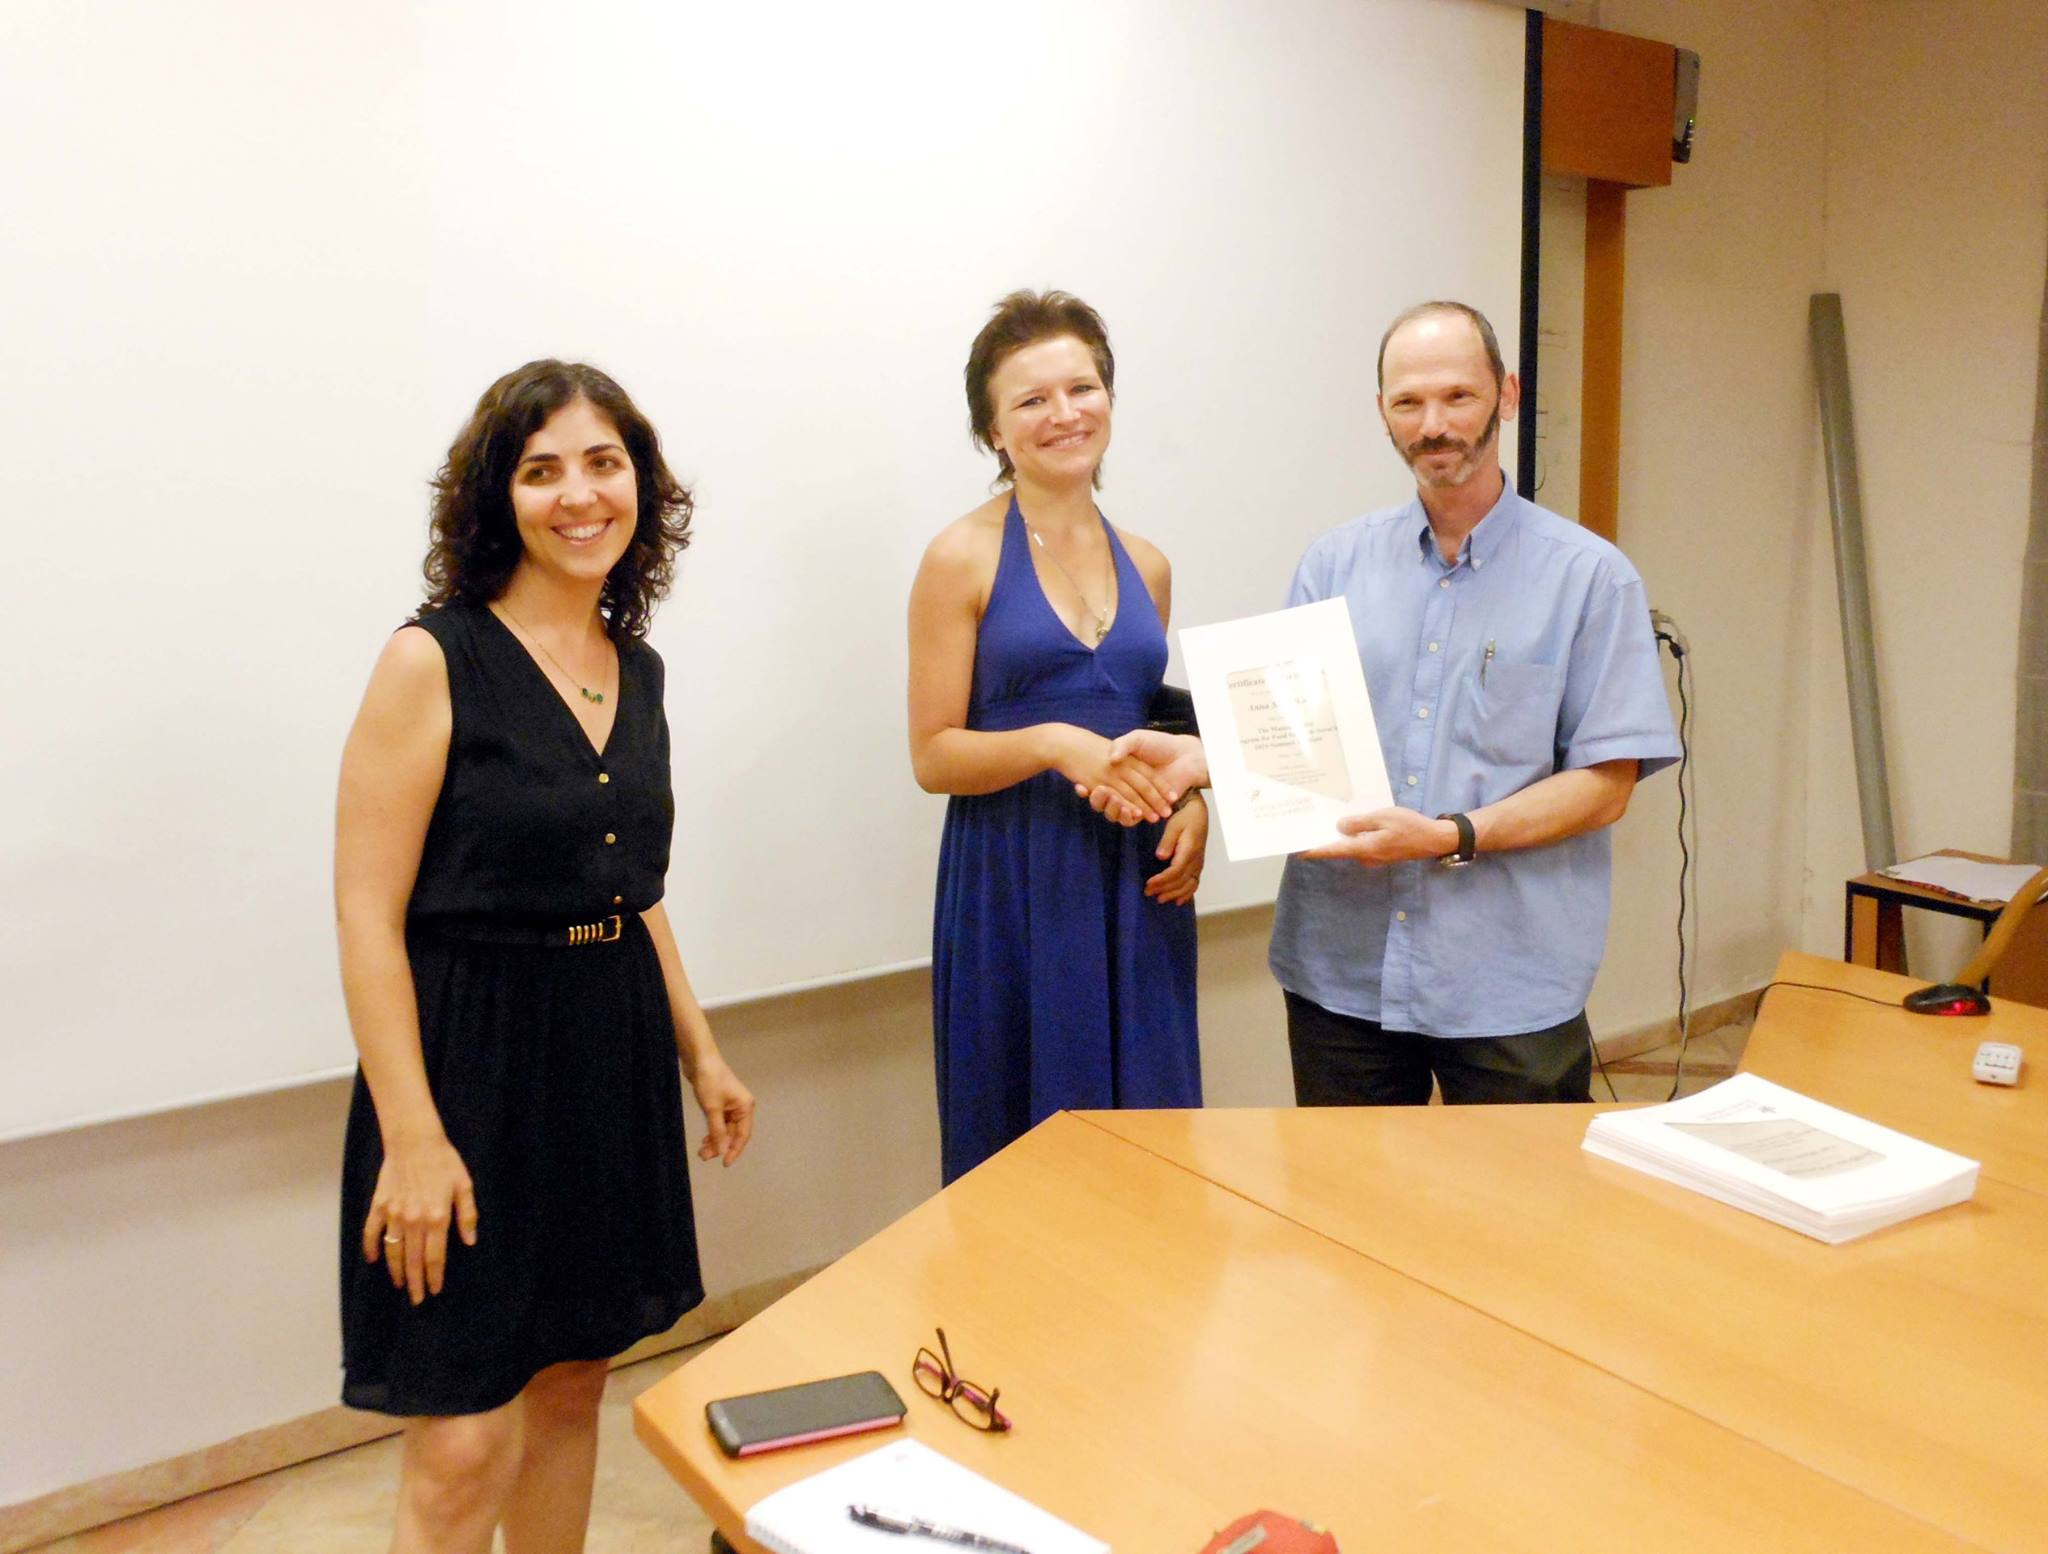 Anna Shmelkova receives her diploma from the program director, Prof. Nir Ohad